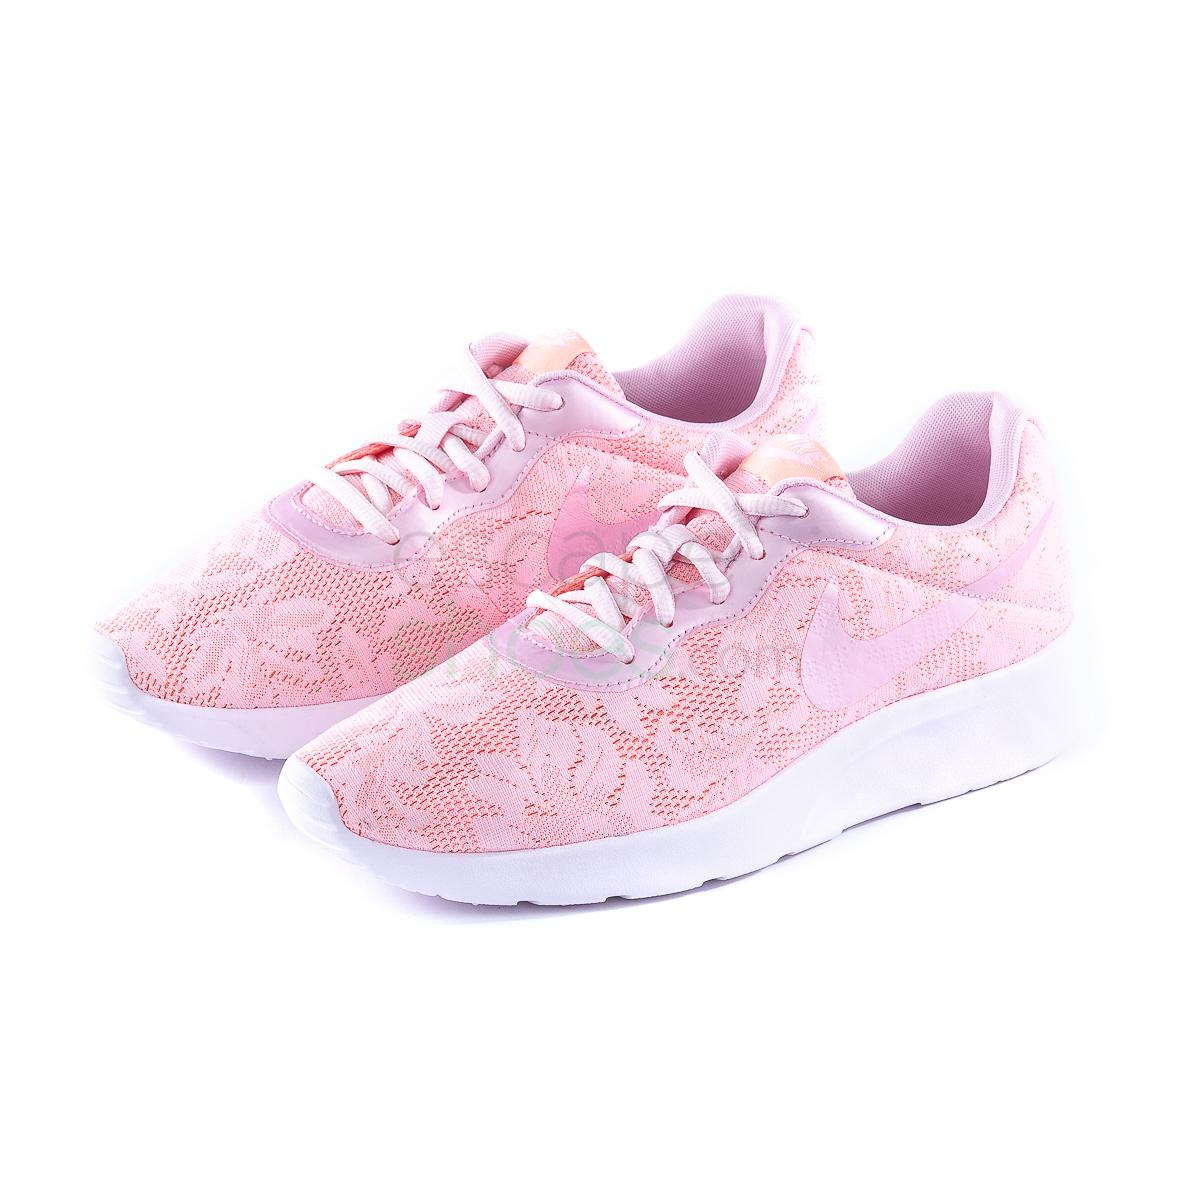 Tanjun Nike Sneakers Pearl 902865 600 Your Here Buy Pink Prism YWED2I9H